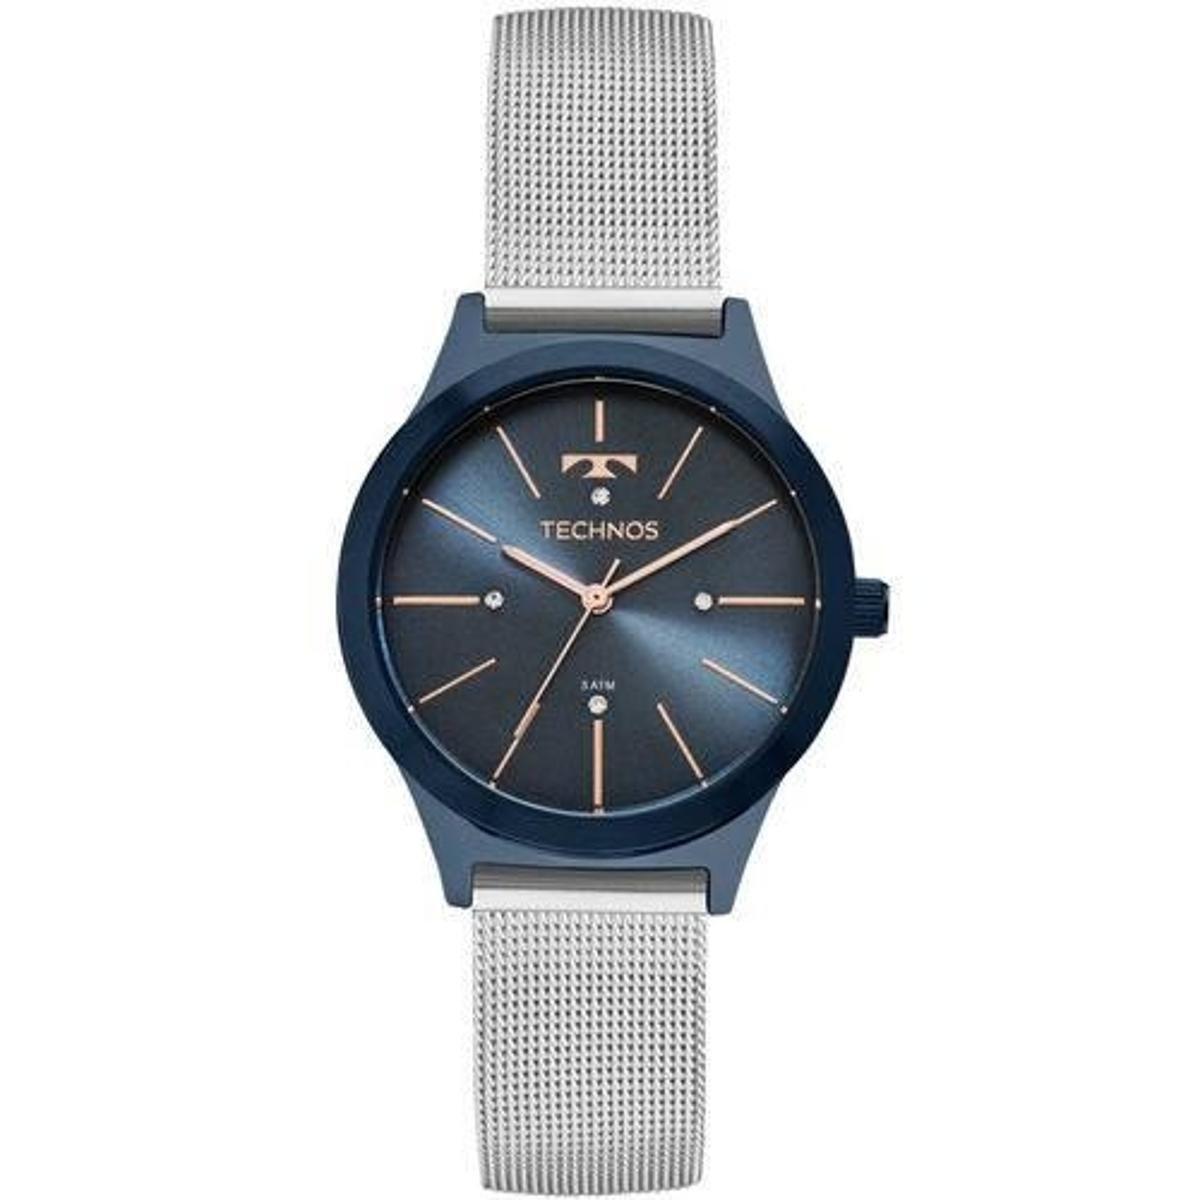 Relógio Technos 2039BO 4A Feminino - Azul - Compre Agora   Zattini 4b6aa92877